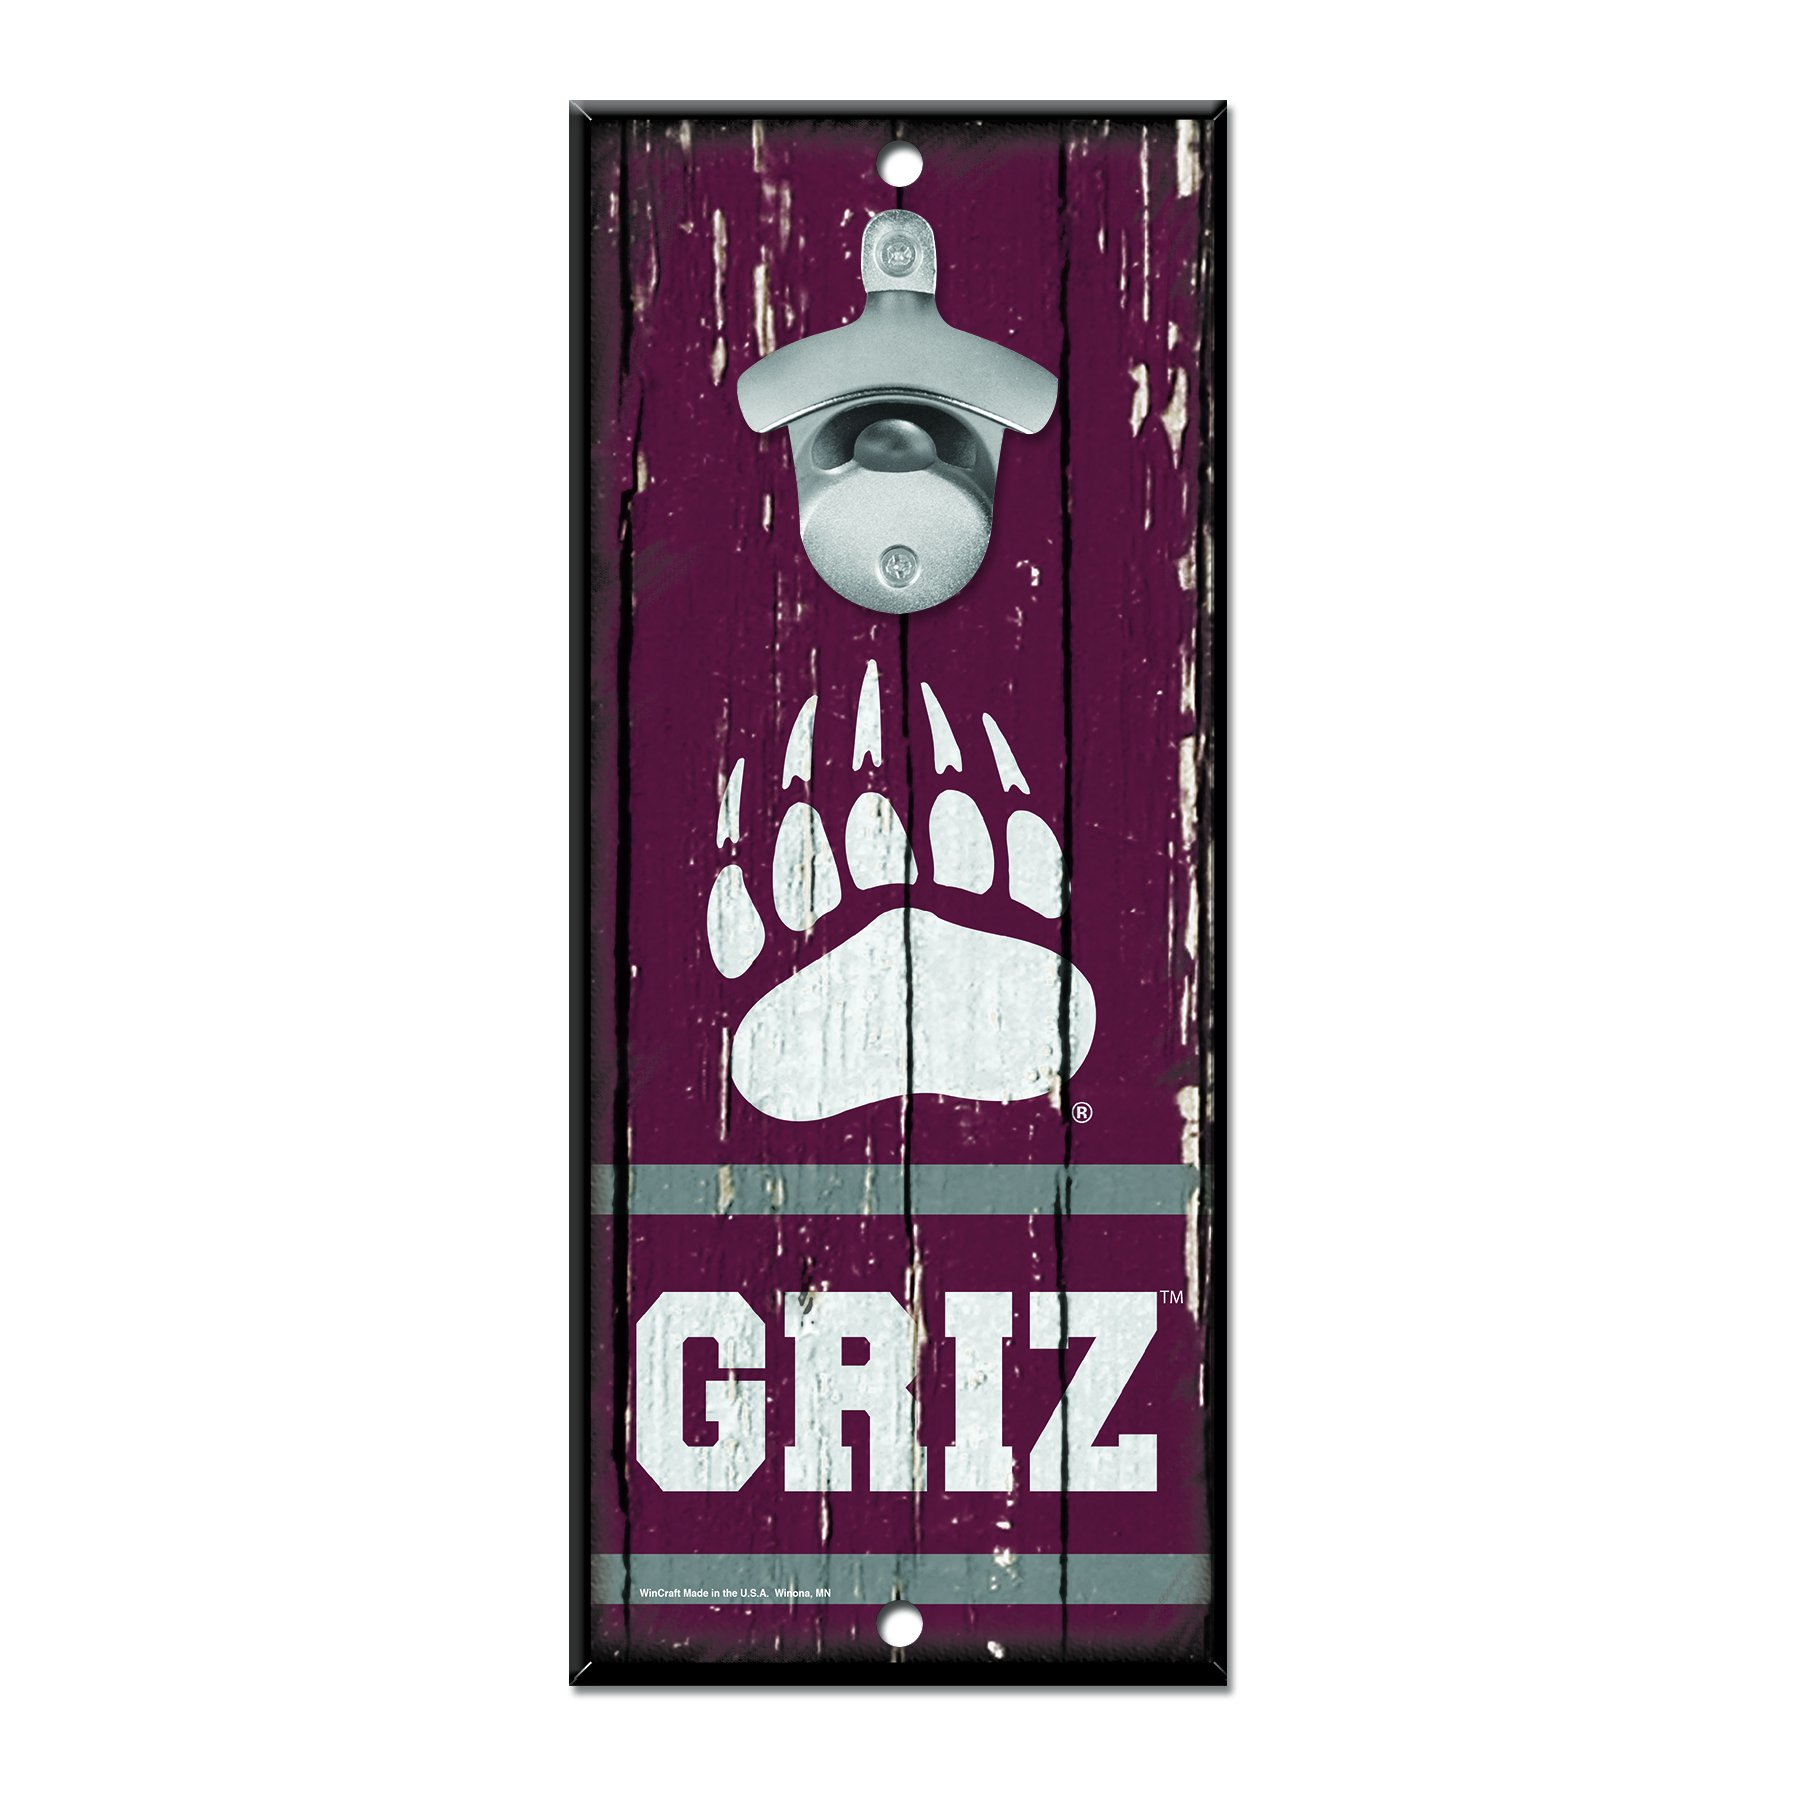 WinCraft NCAA Montana Grizzlies Wood Bottle Opener Sign, 5'' x 11'', Multicolor